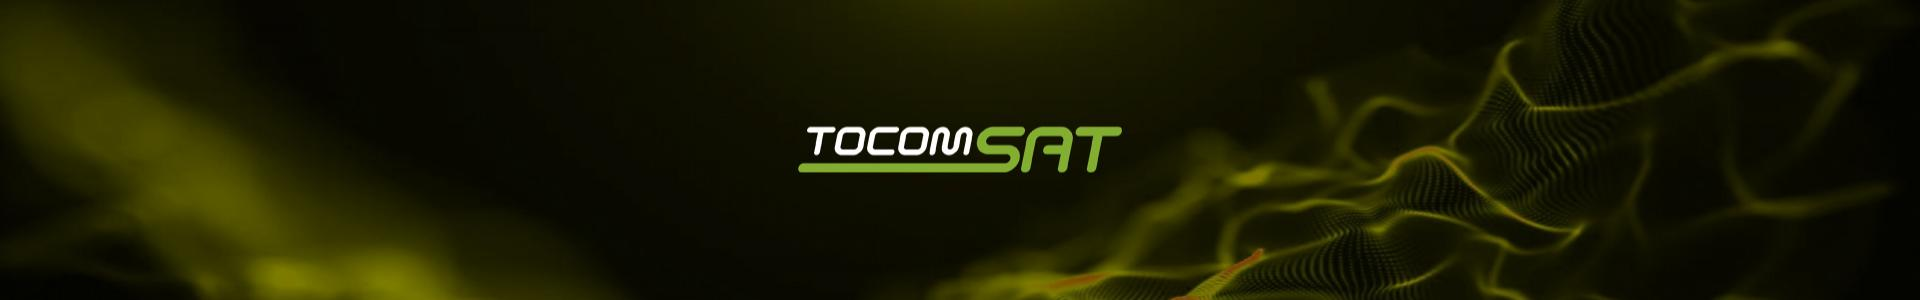 tocomsat-share.jpg